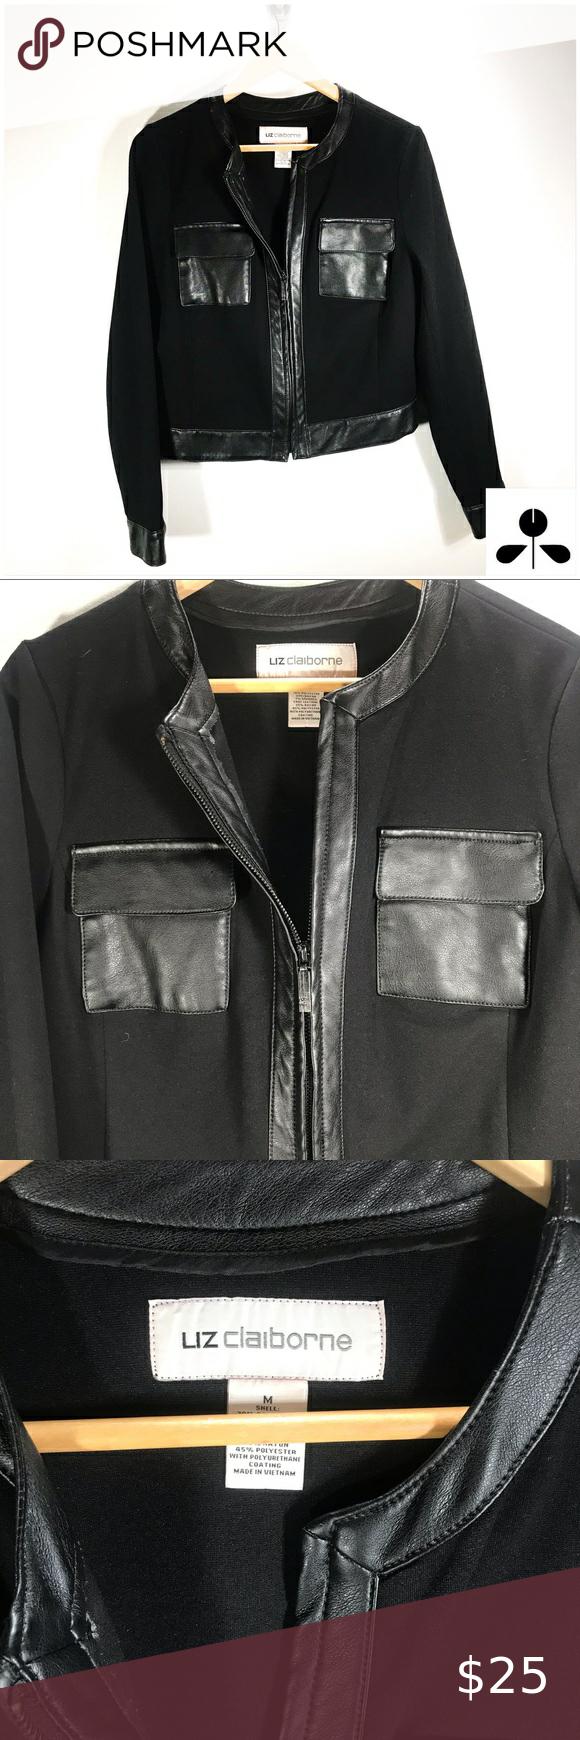 Liz Claiborne Jacket In 2020 Liz Claiborne Zip Ups Claiborne